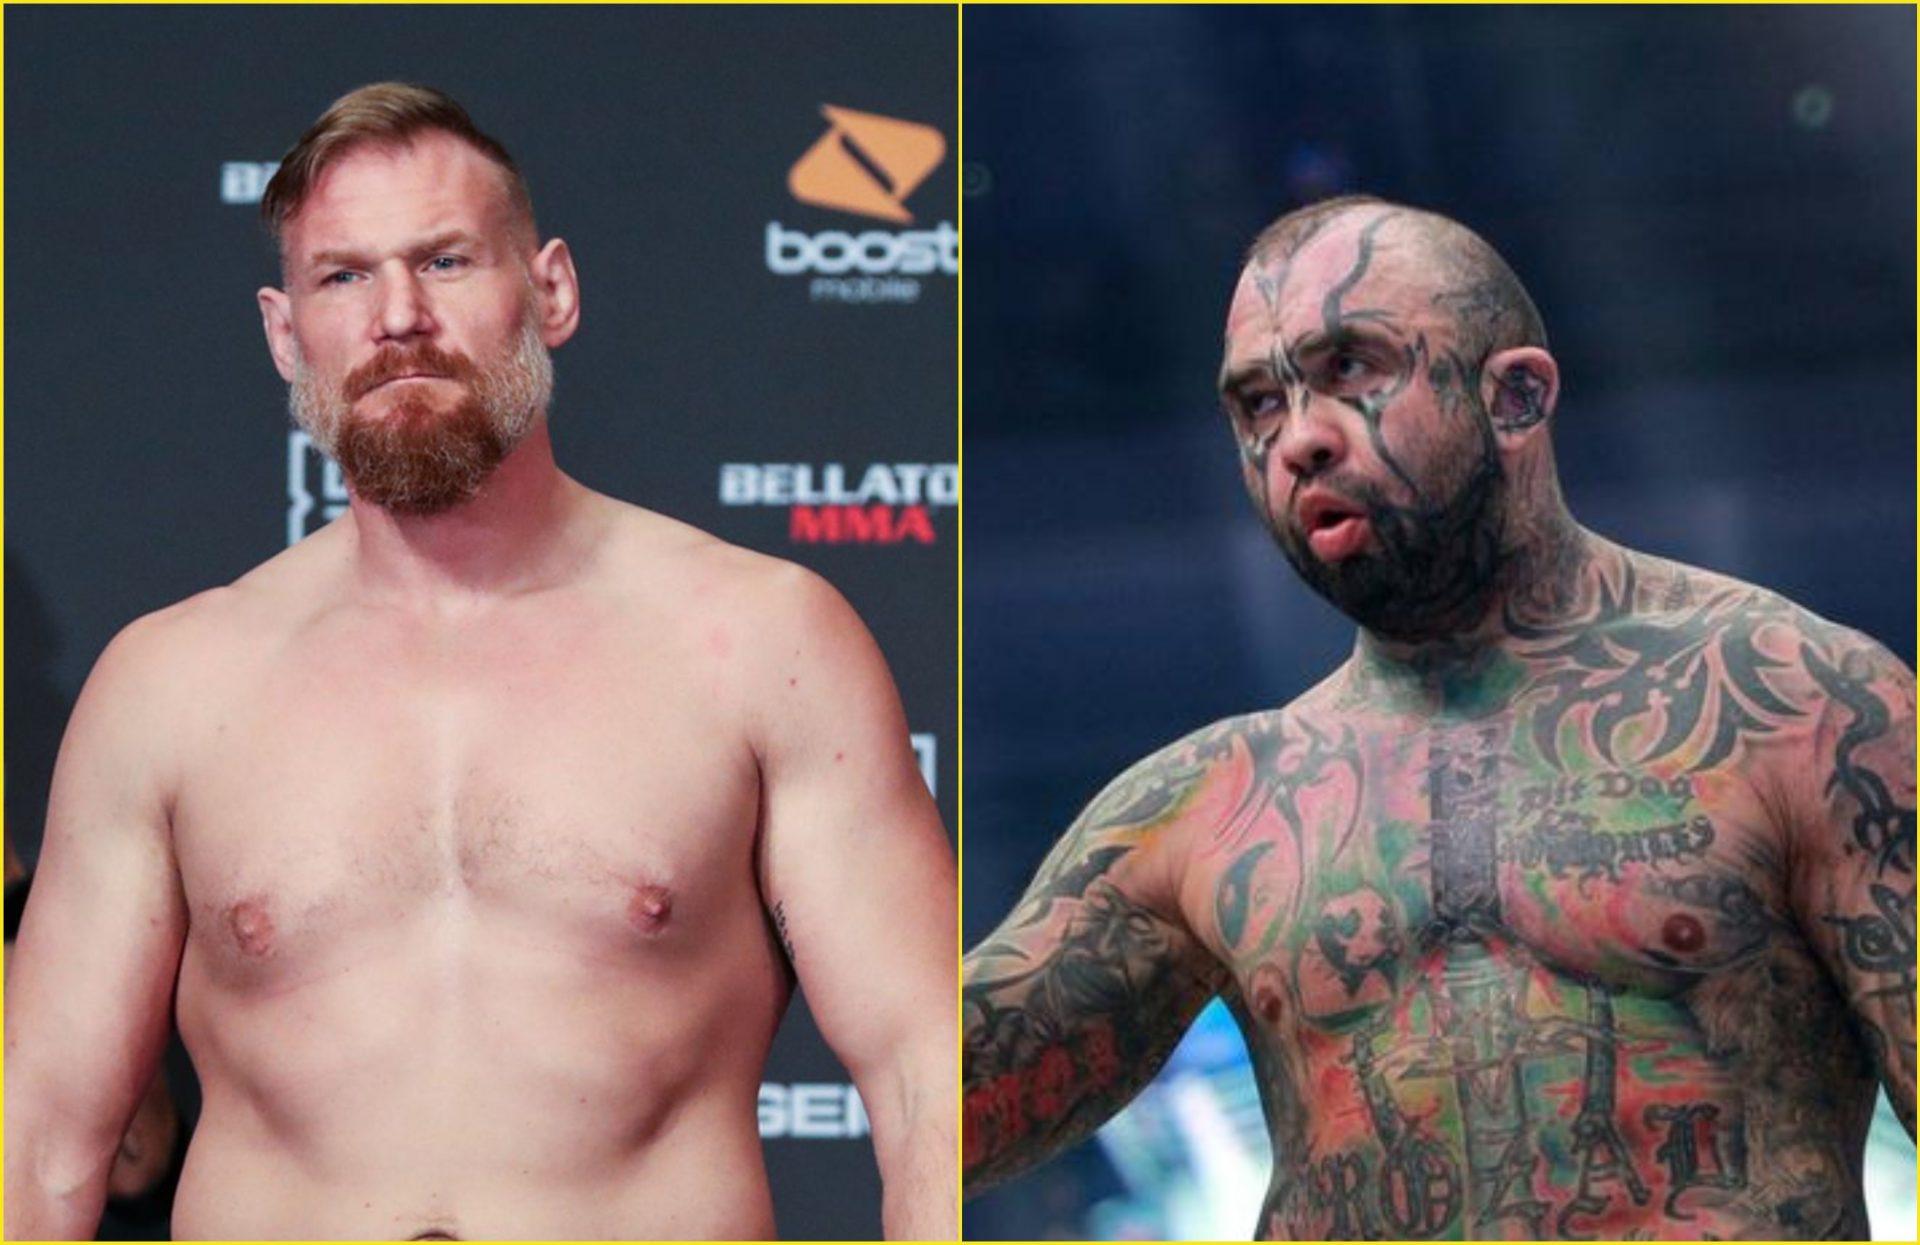 UFC veteran Josh Barnett to fight former KSW champion Marcin Rozalski in Bare Knuckle Boxing bout - Josh Barnett